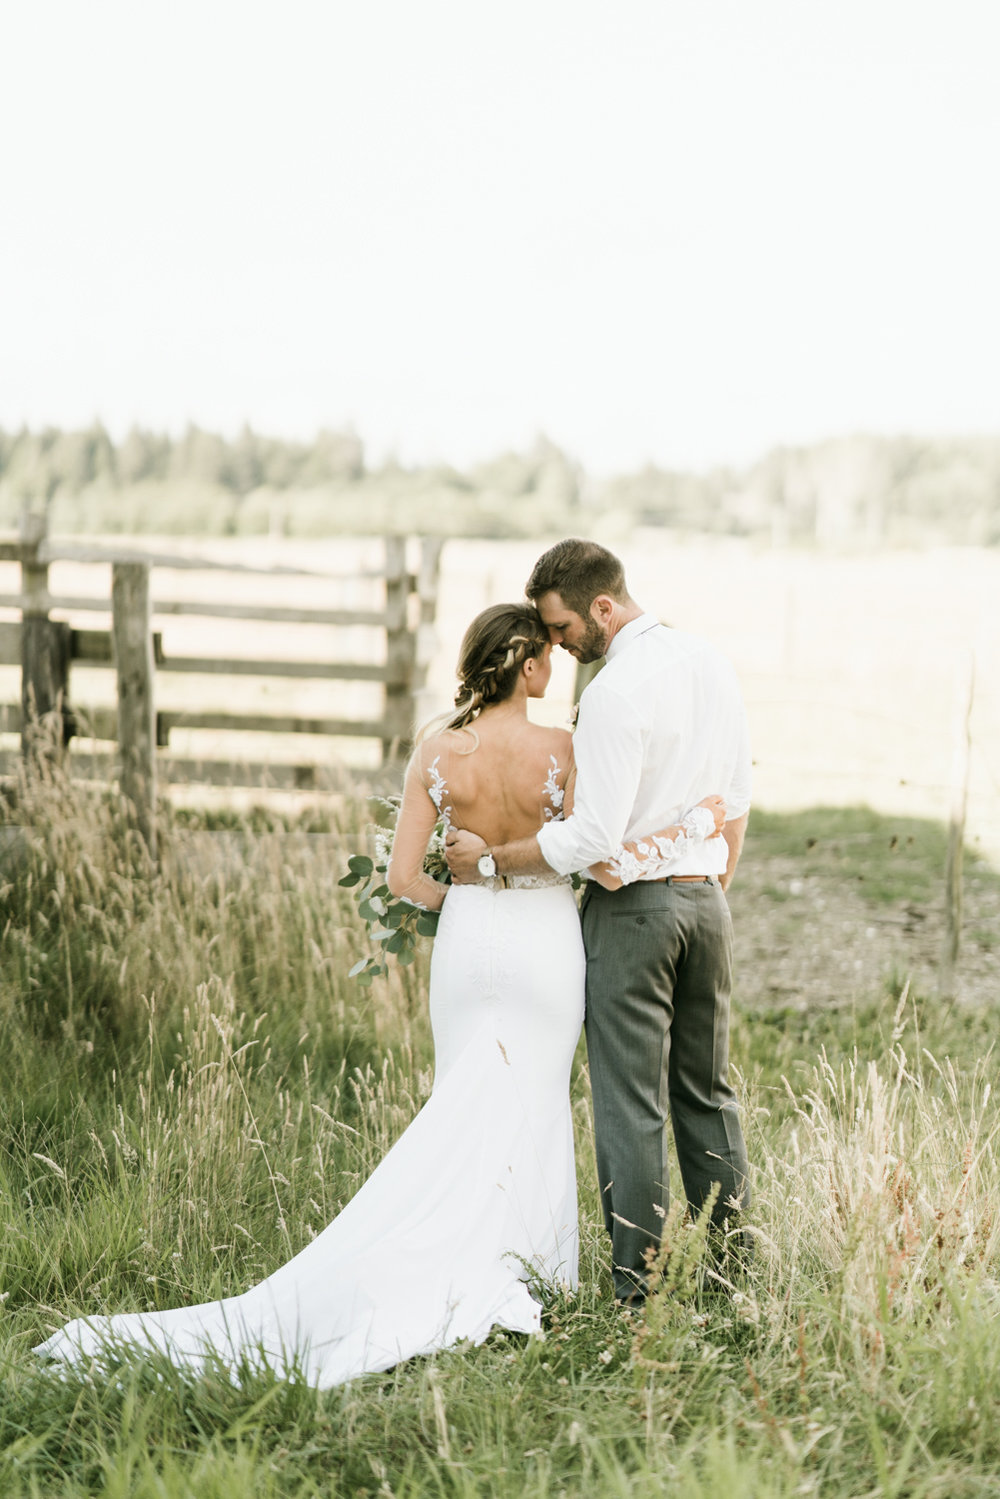 April Yentas Photography - South Bend Shoot-22.jpg